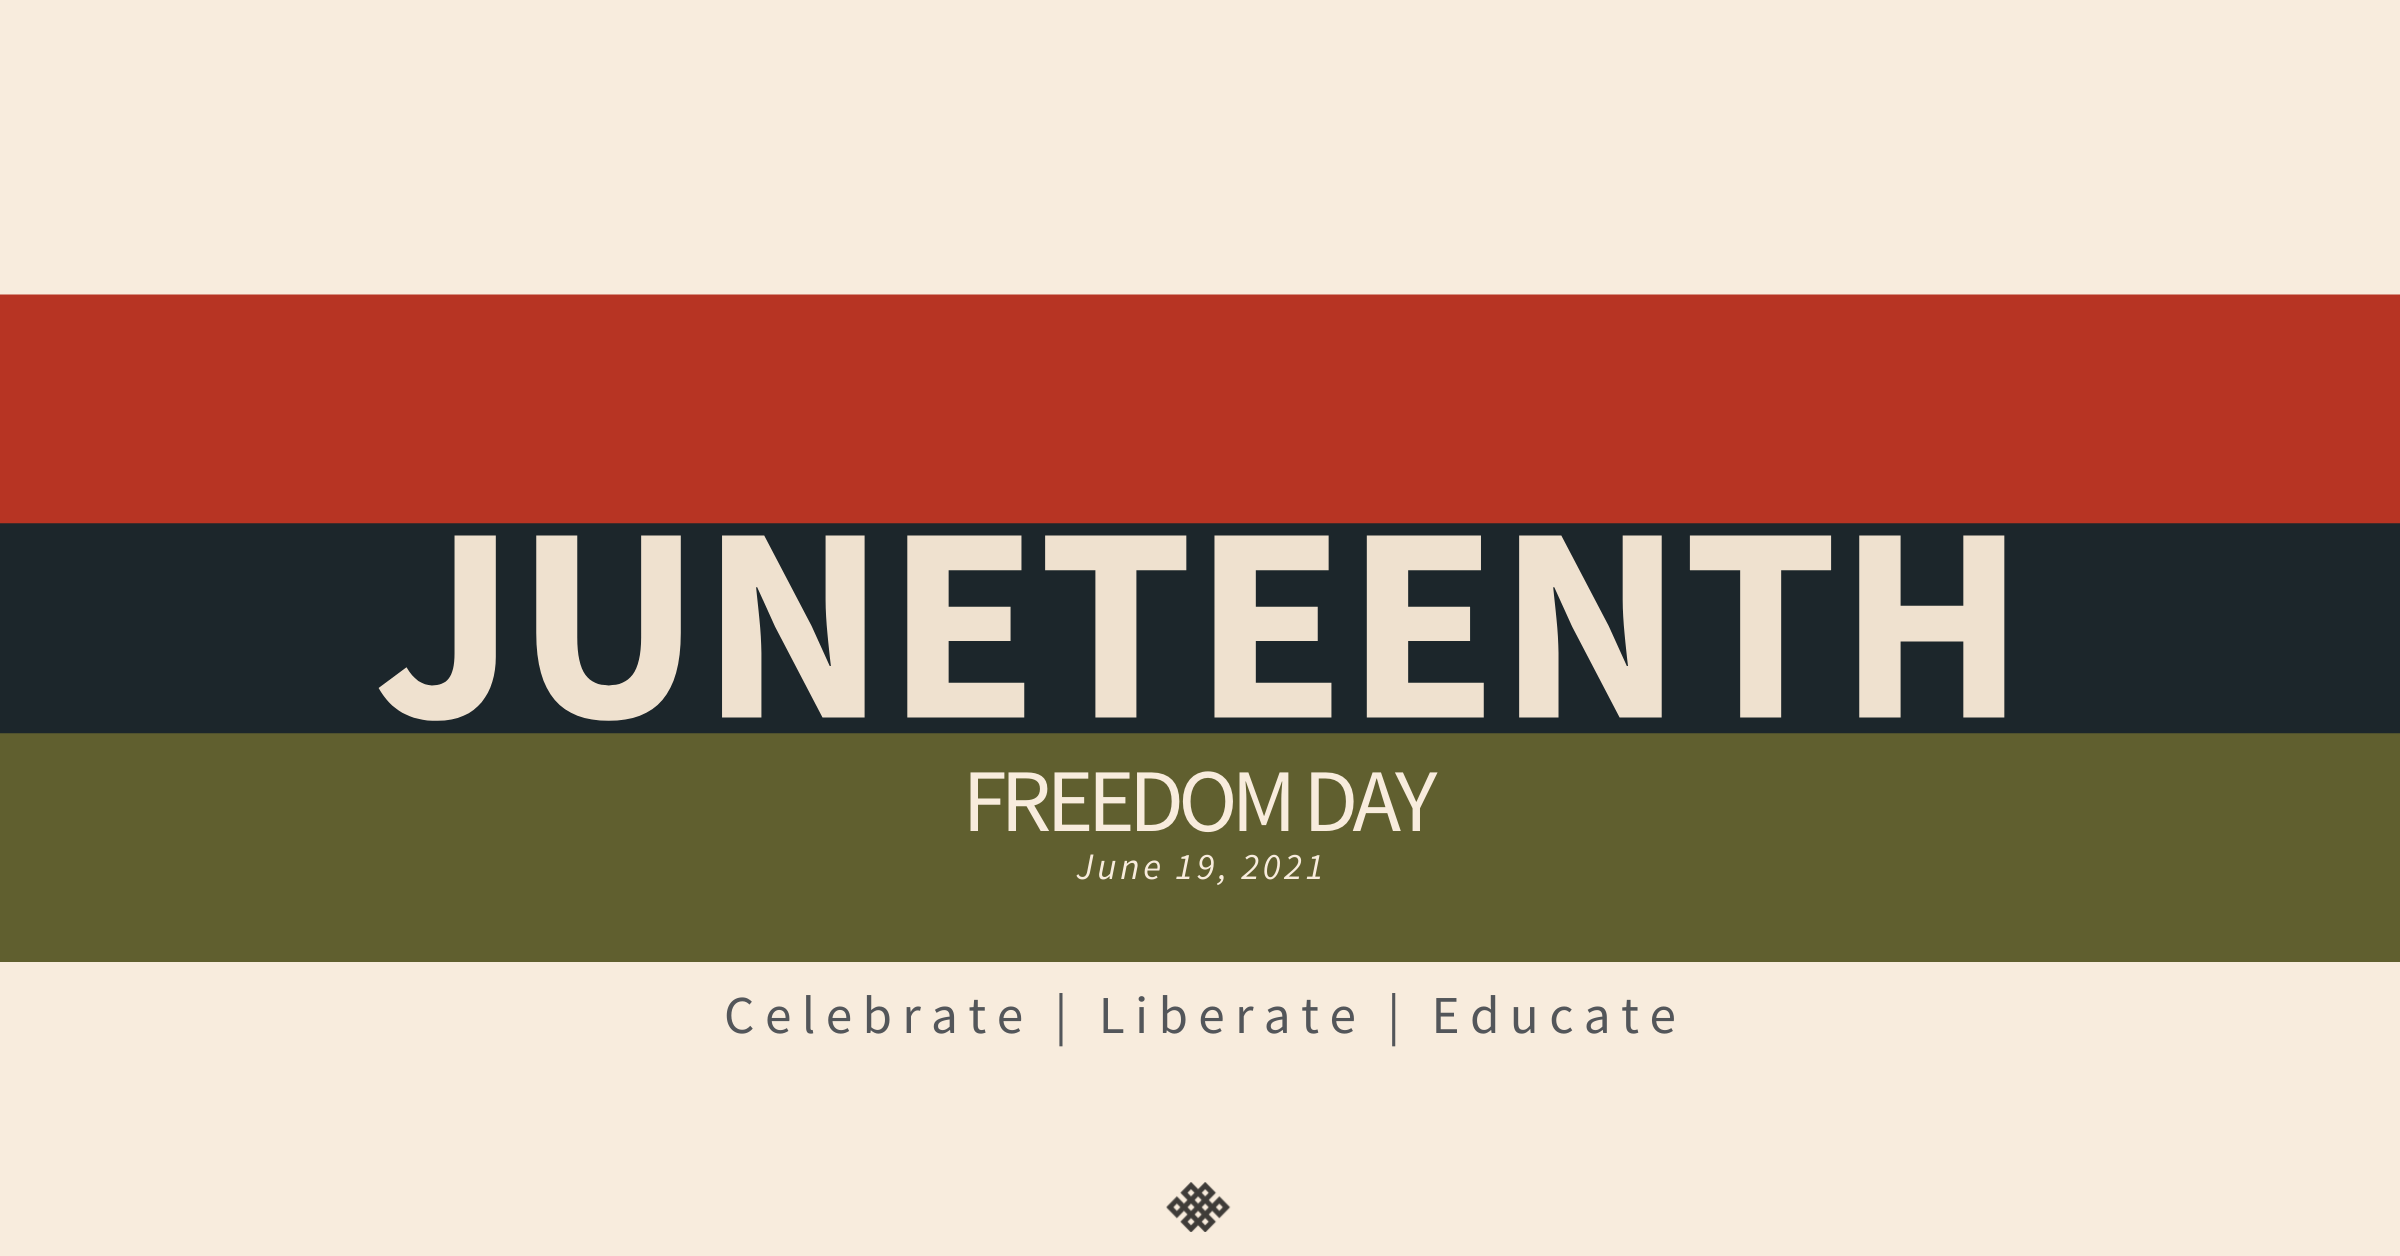 Juneteenth: Freedom Day. BGSF